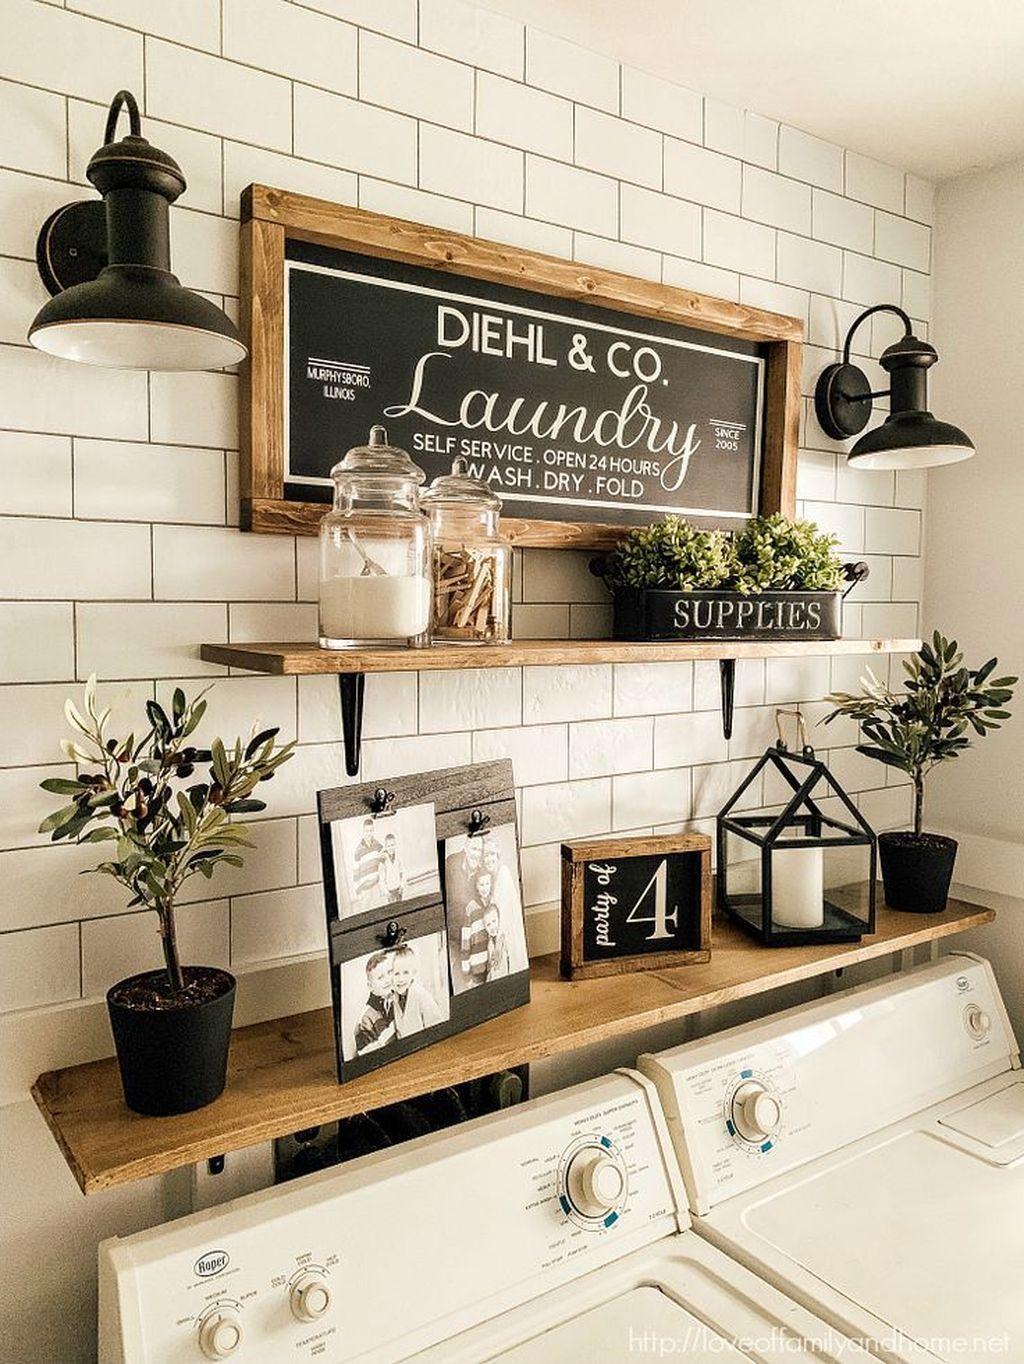 35 Fascinating Rustic Laundry Room Decor Ideas Laundry Room Decor Rustic Laundry Rooms Laundry Decor